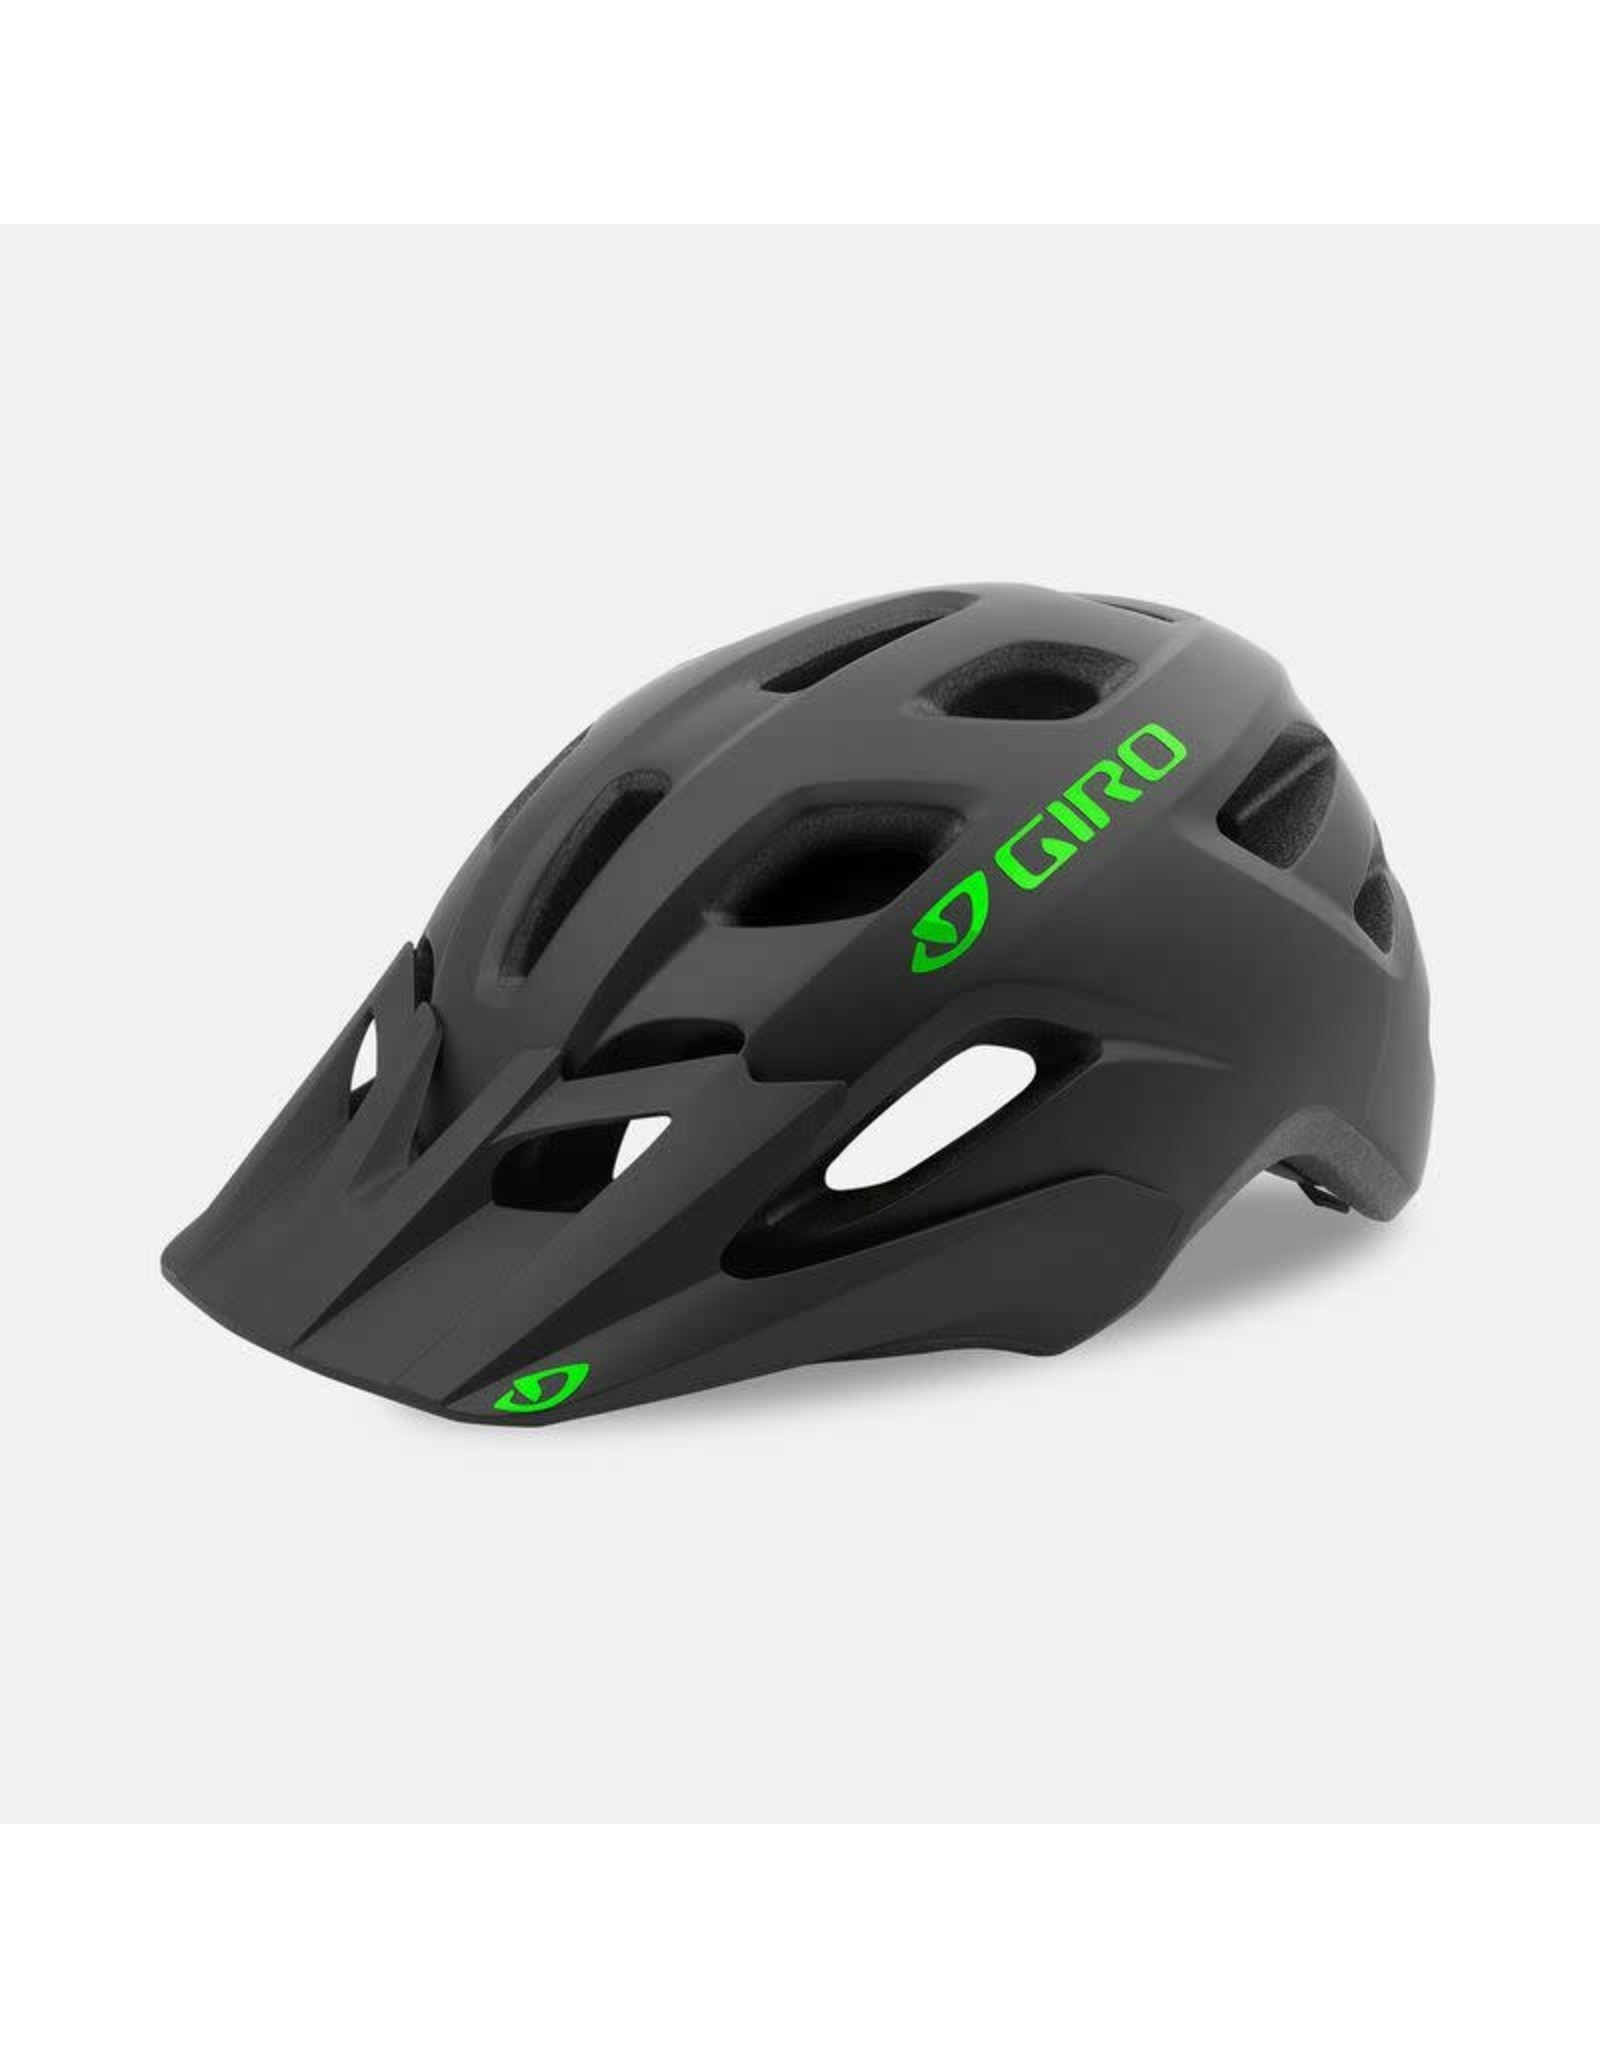 Giro Giro Tremor Youth Helmet Mat Black